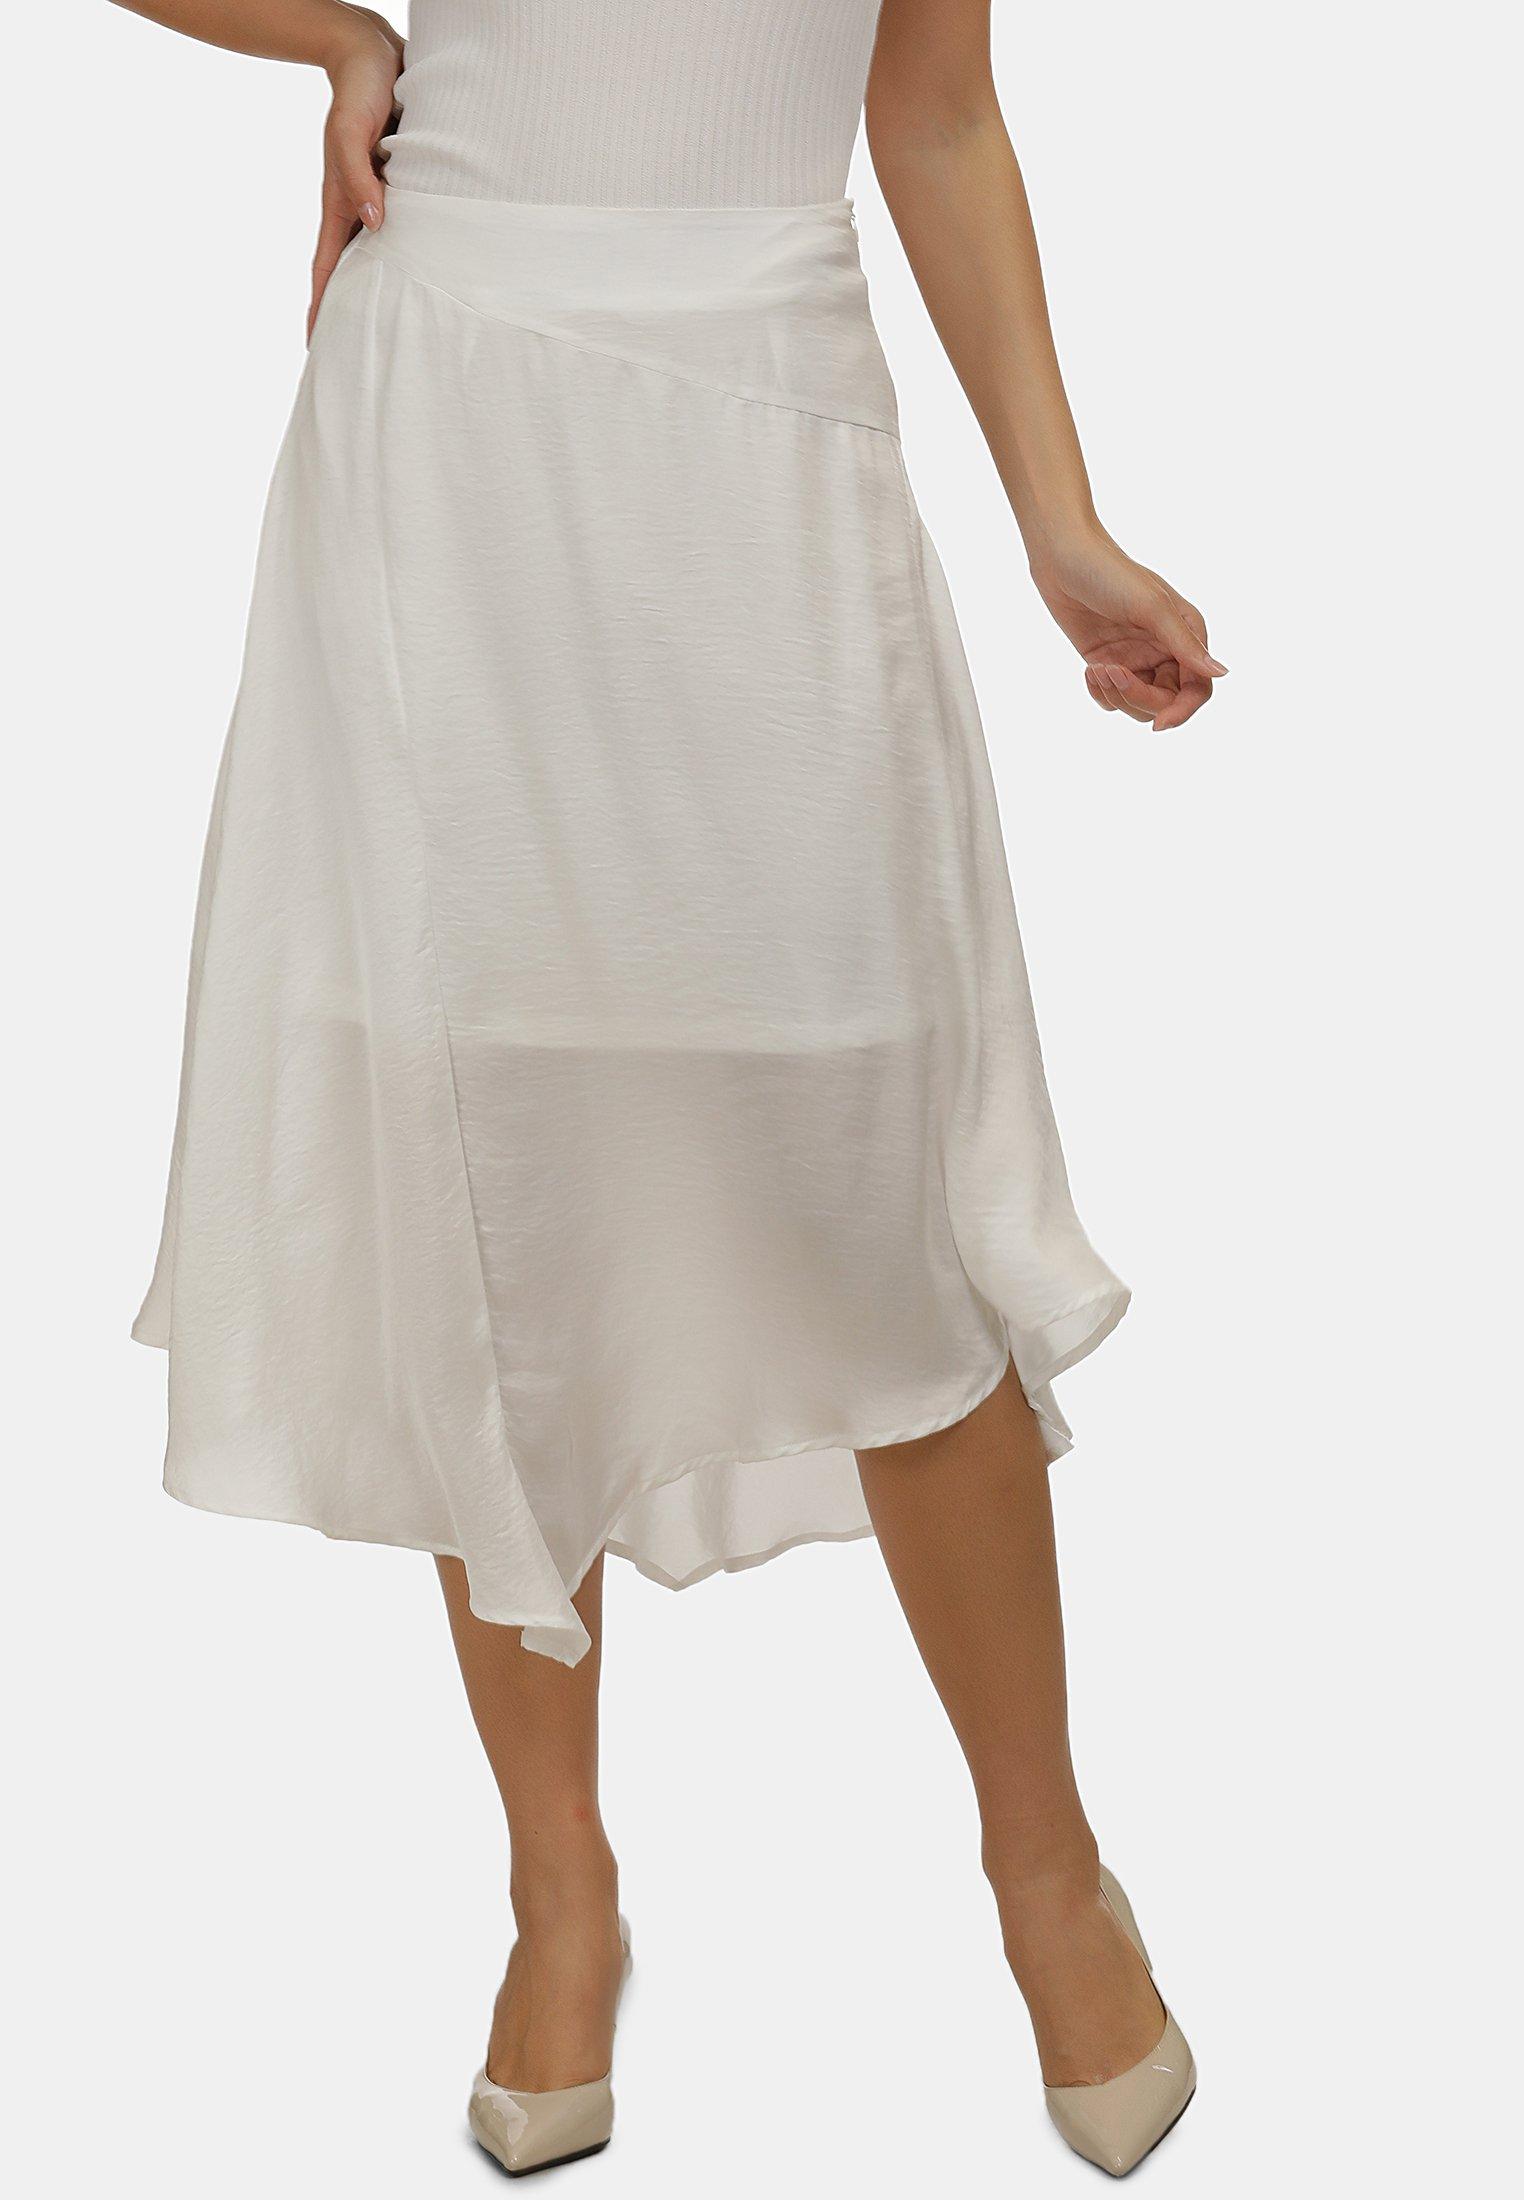 Shop Women's Clothing usha A-line skirt weiss IY4fcrqL0